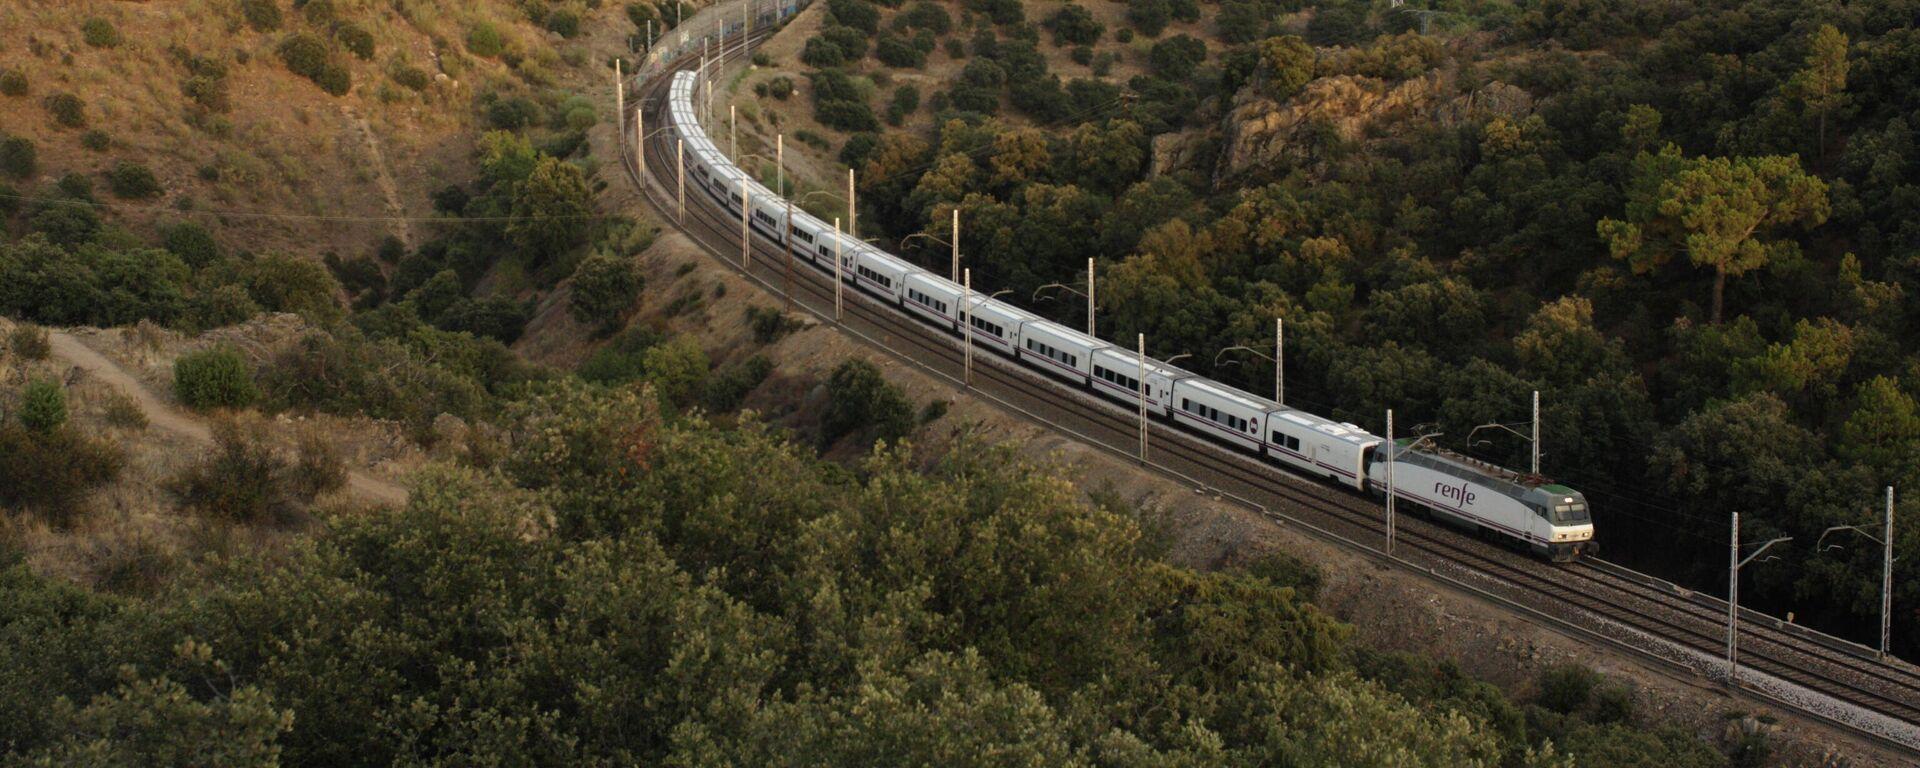 Un tren a su paso por Torrelodones - Sputnik Mundo, 1920, 27.04.2021